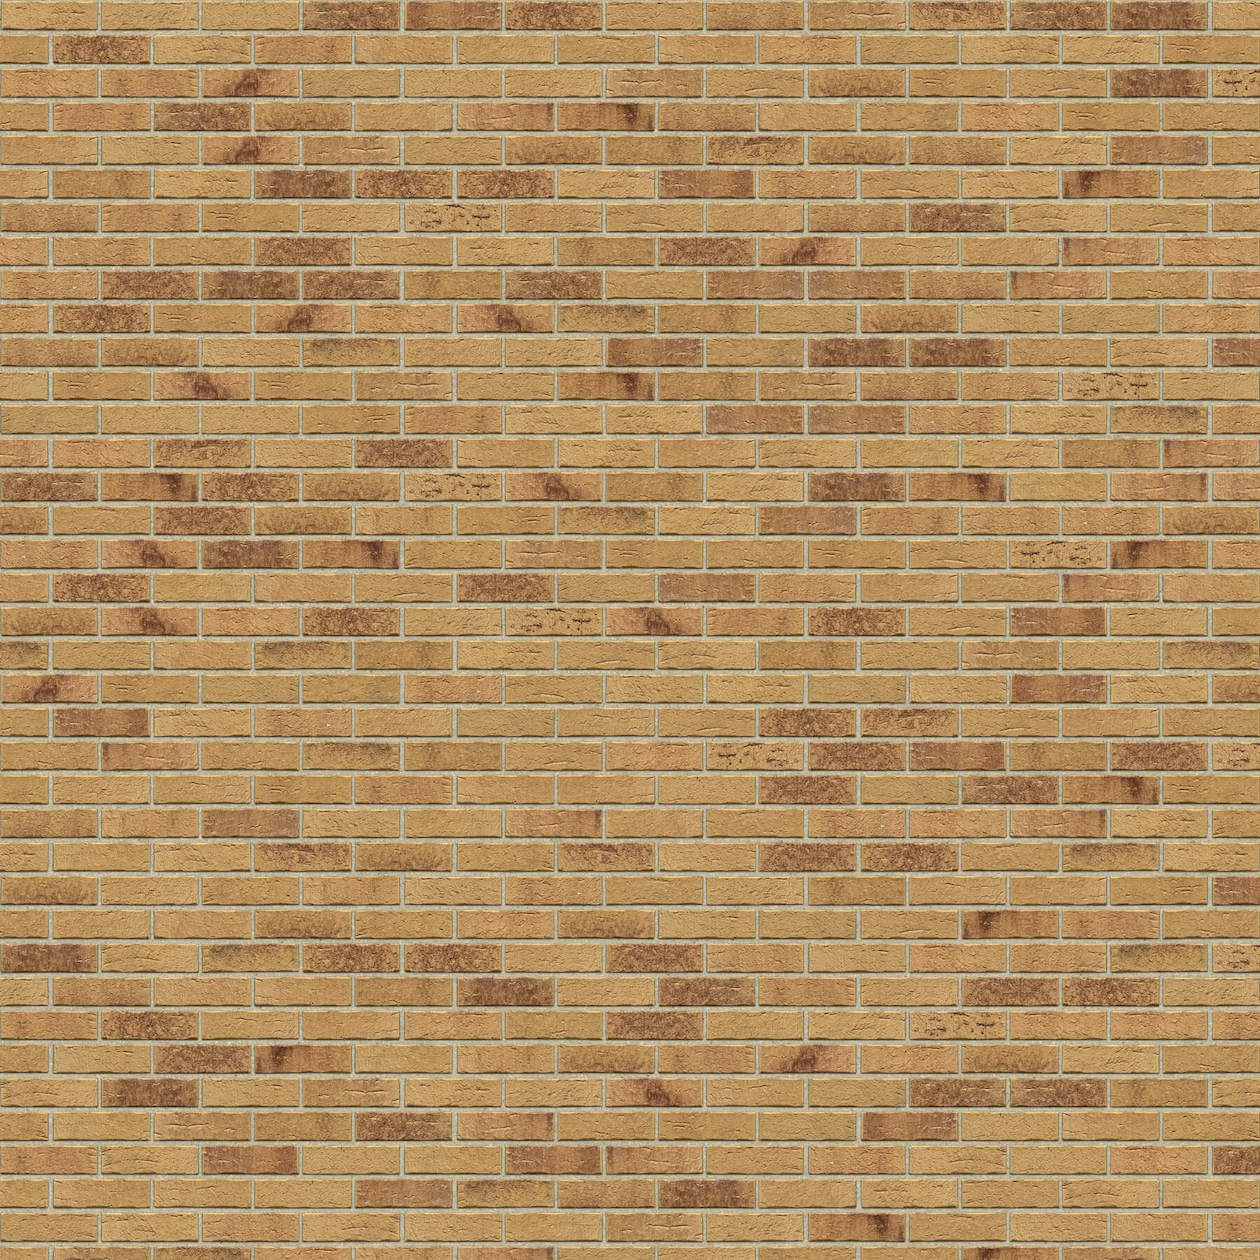 Puna-cigla-FeldHaus-Klinker-brick-house-nf-k-688-Bez Fuga